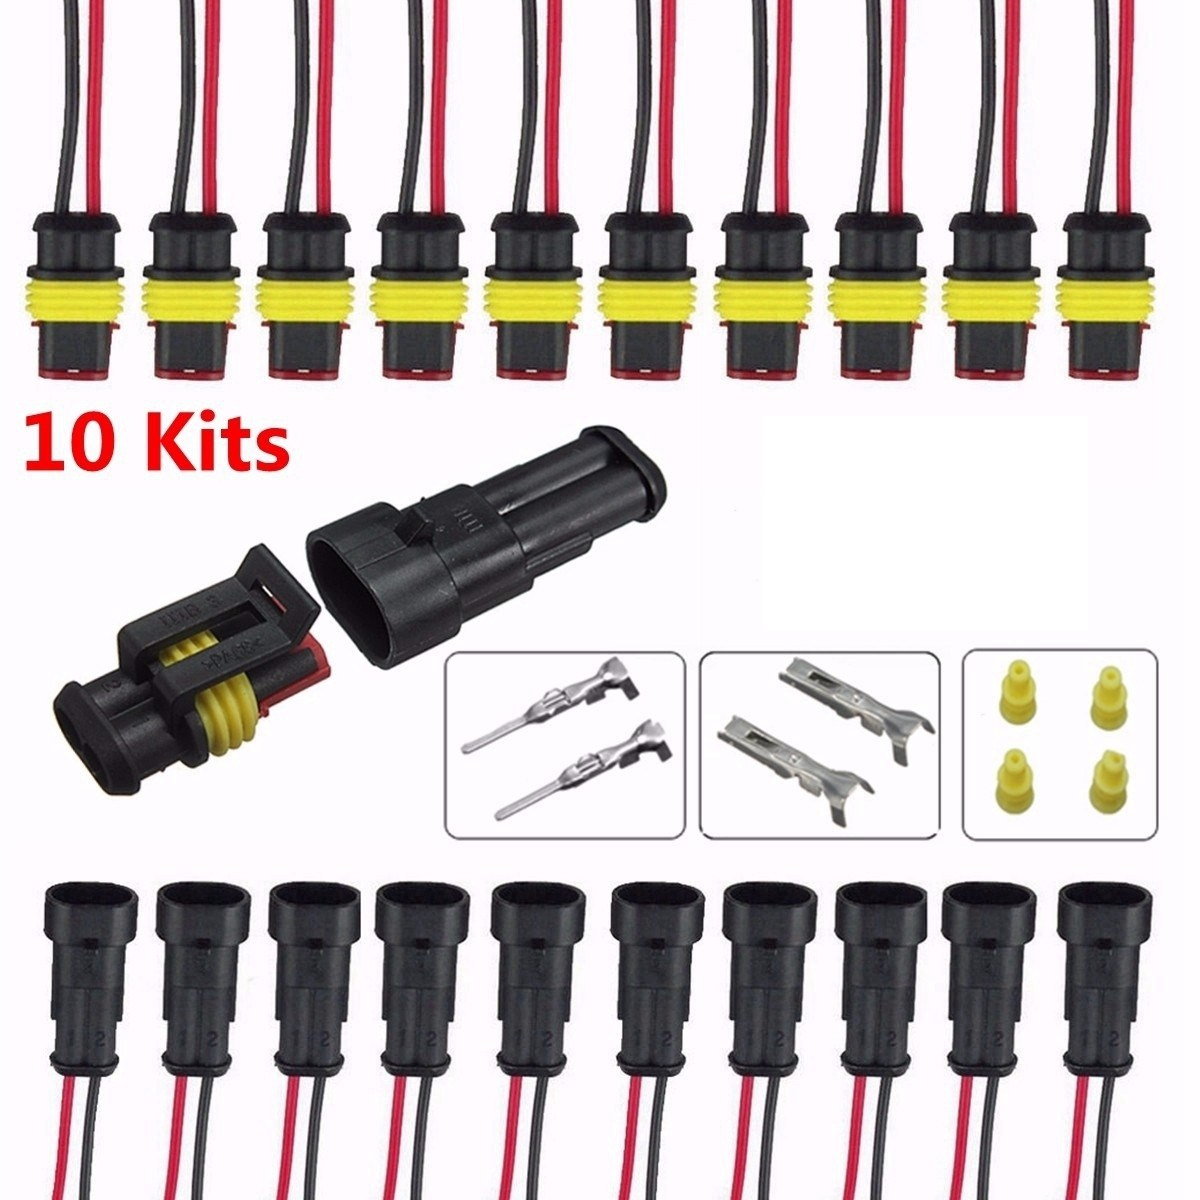 5 set Kit di prese elettriche impermeabili sigillate auto elettriche a 3 pin sigillate a 3 poli Connettore impermeabile